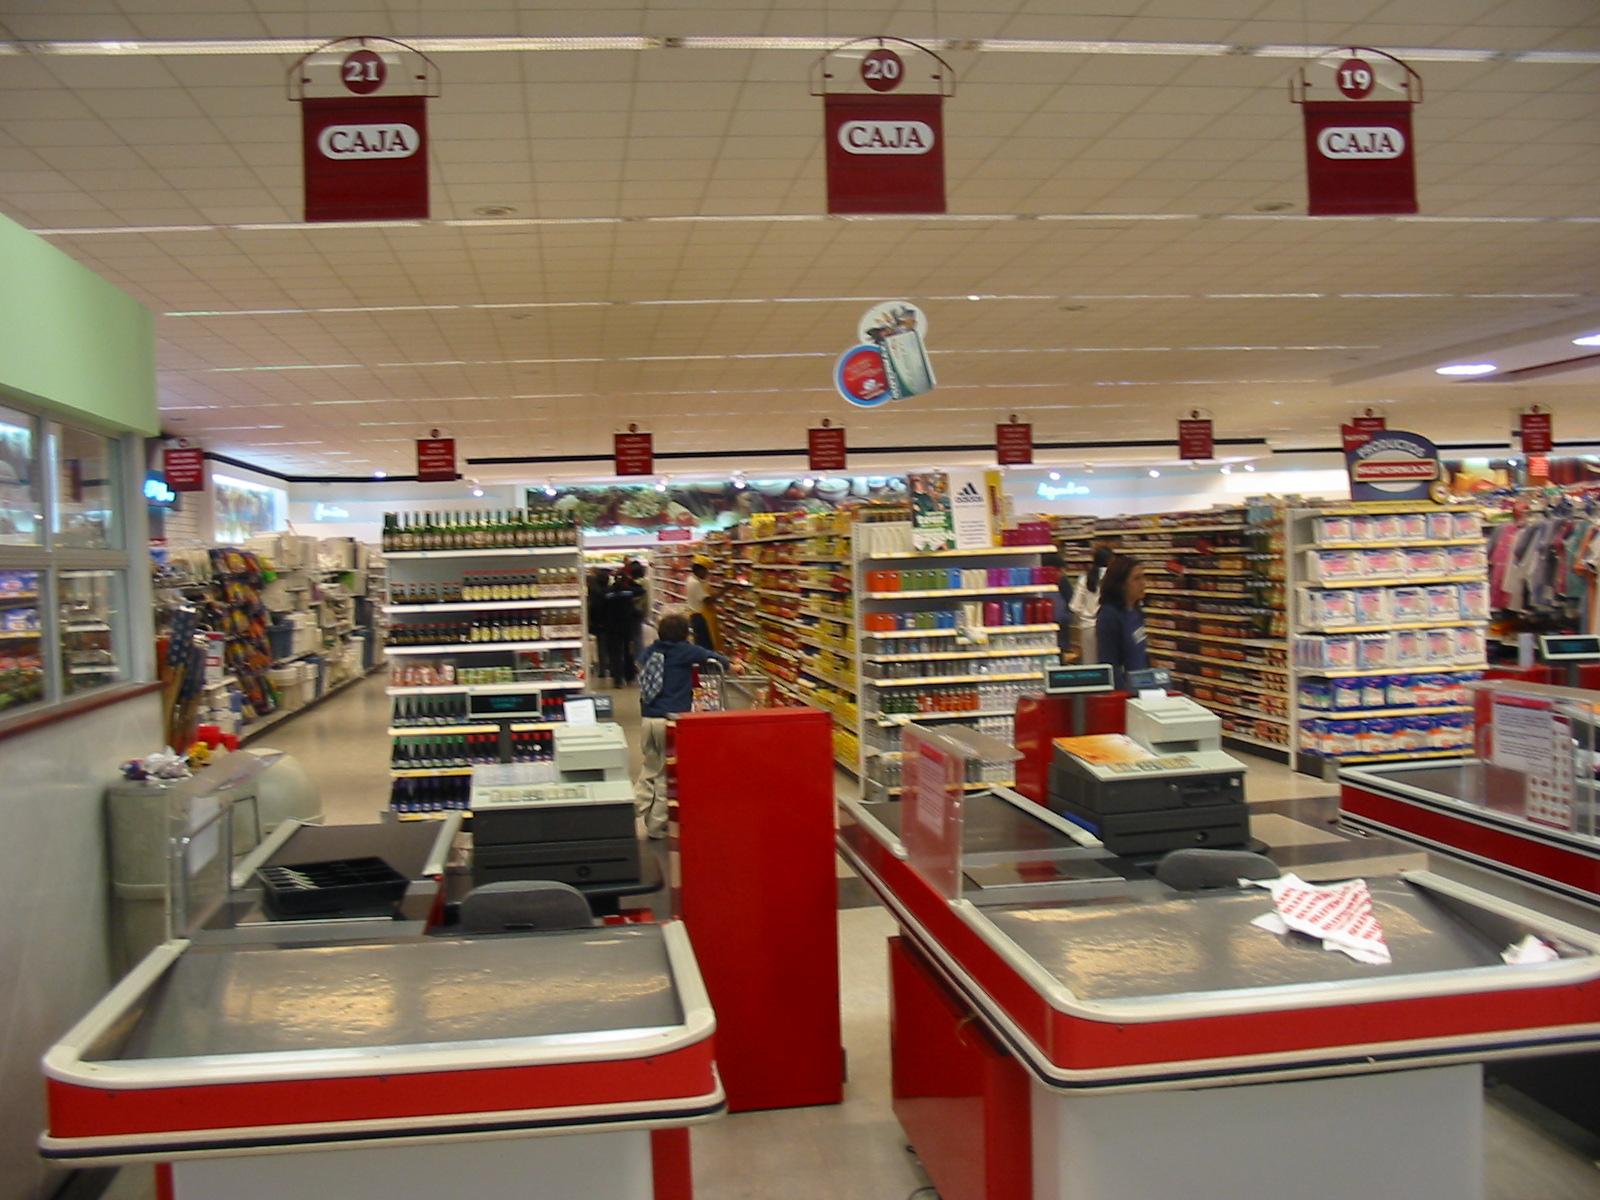 supermercado_cajas